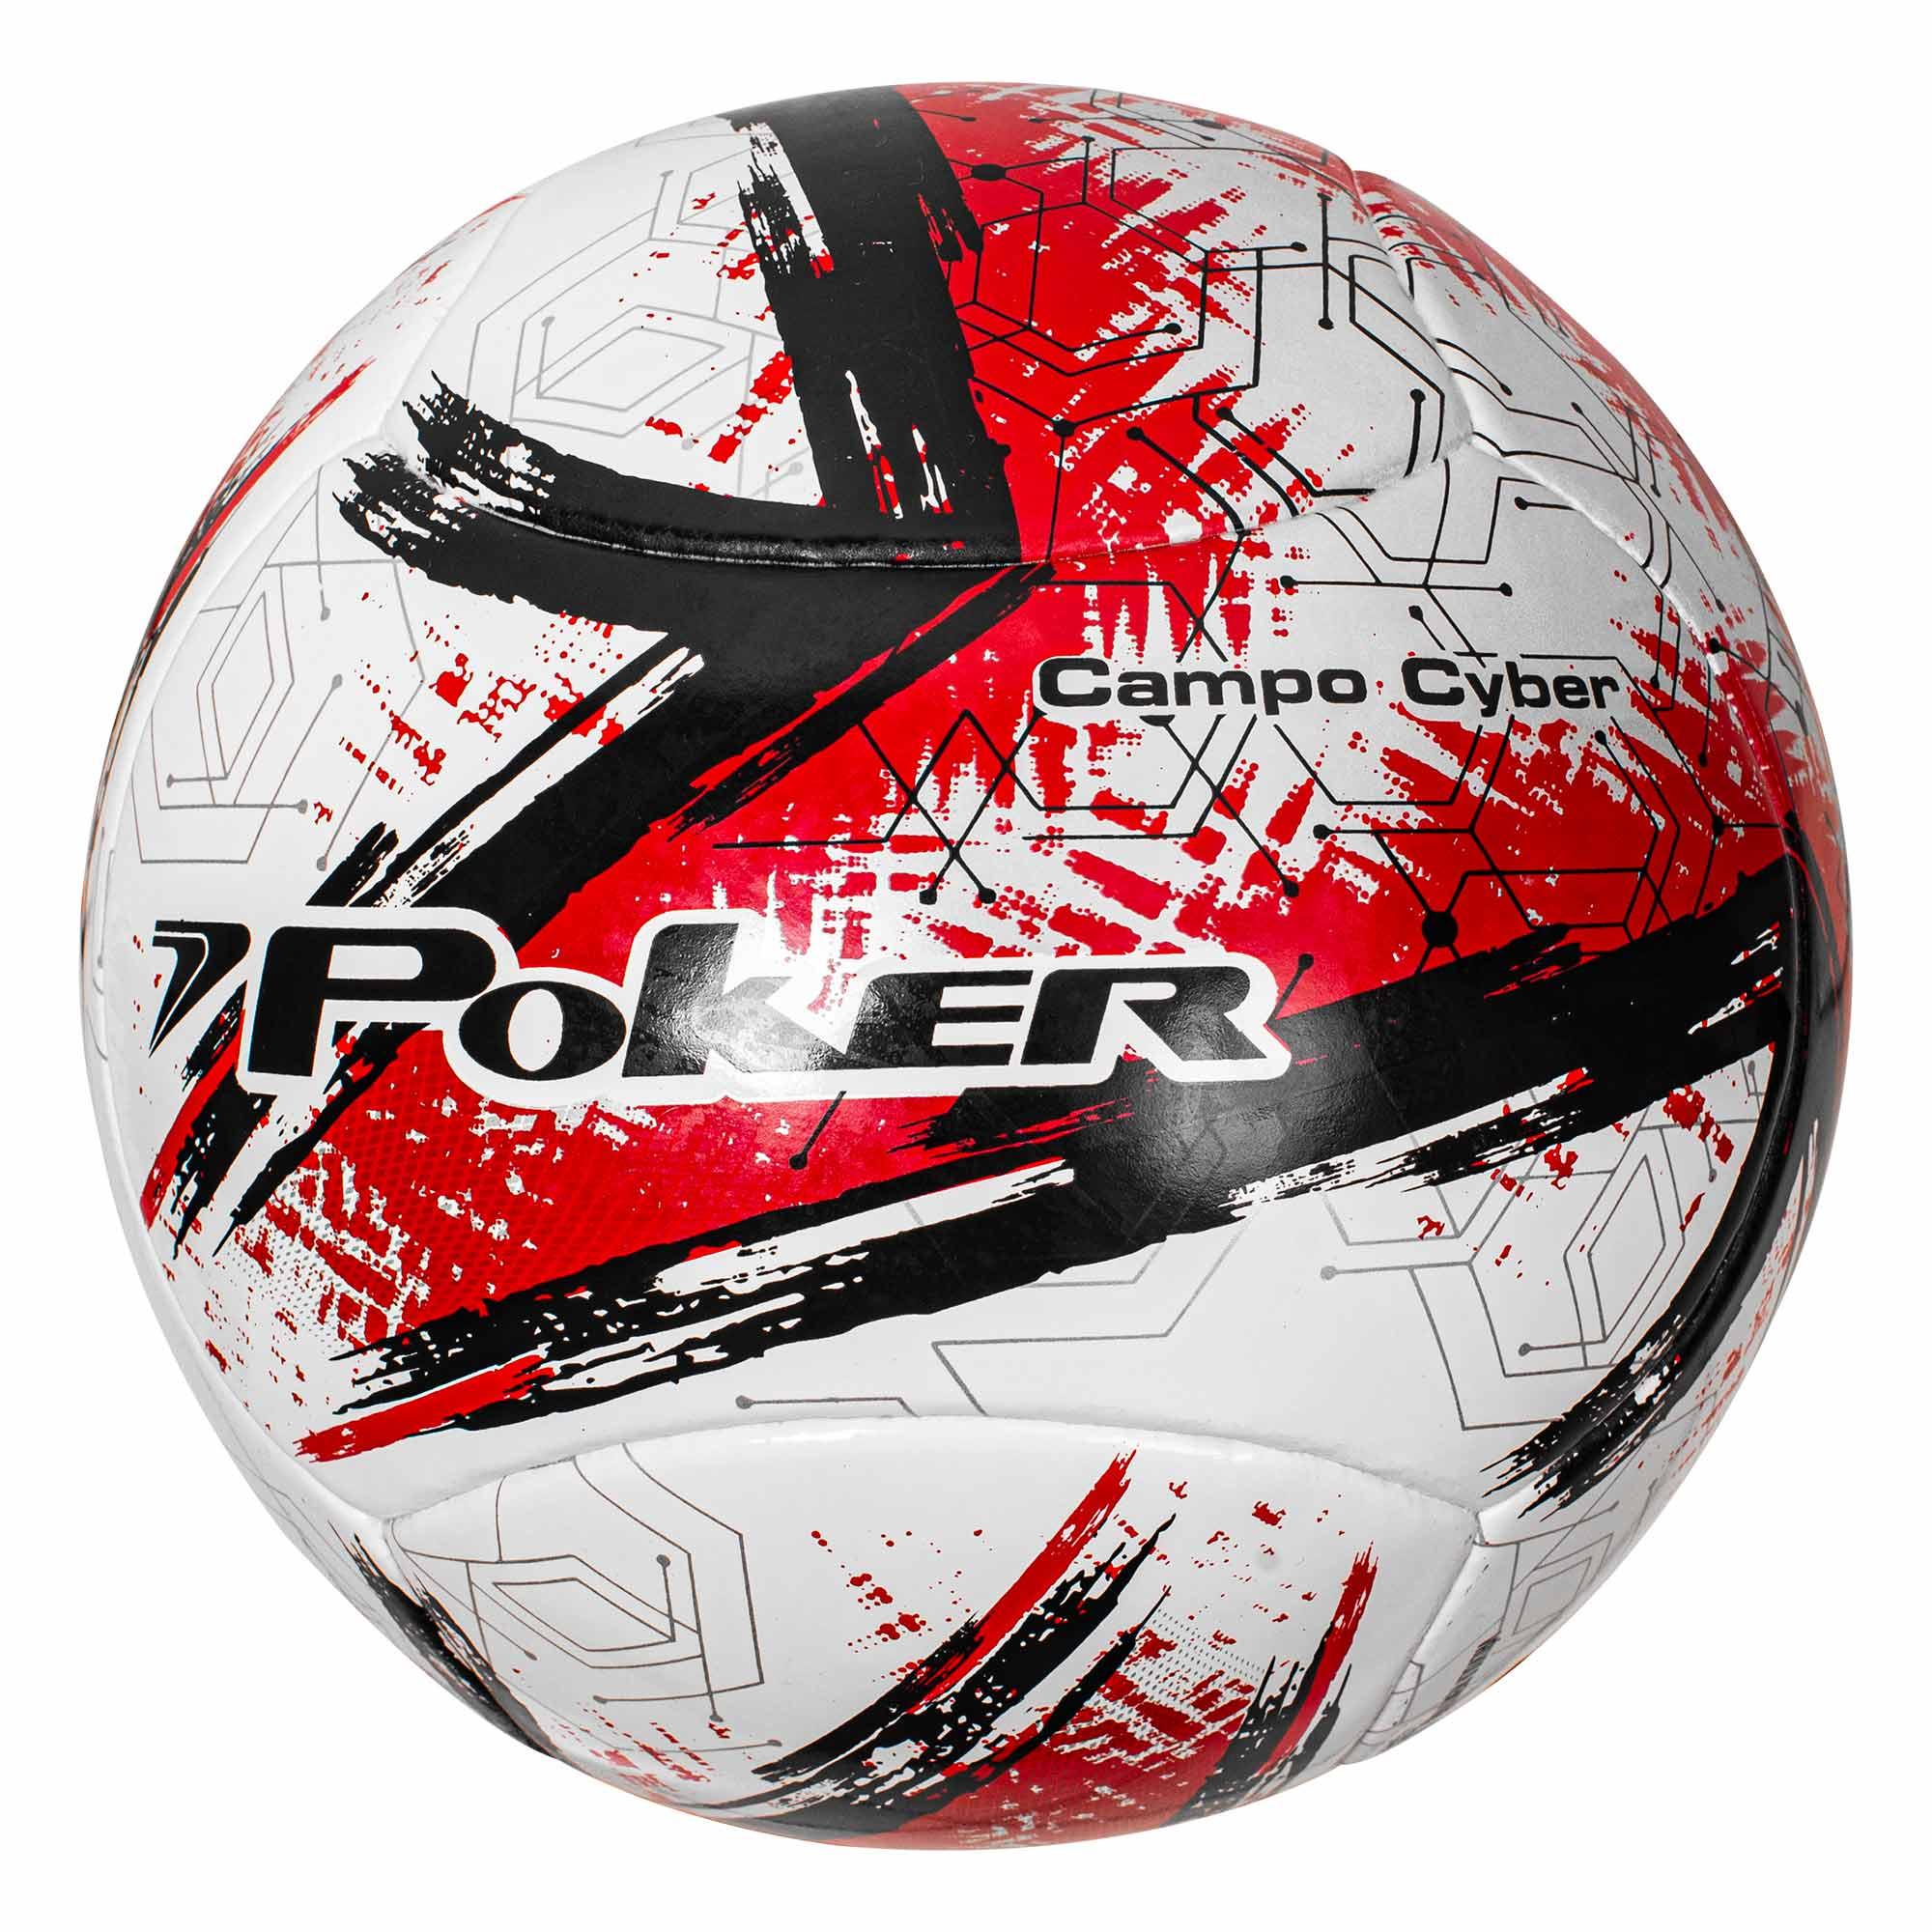 Bola Futebol de Campo Funsionada 6 Gomos Cyber 05806